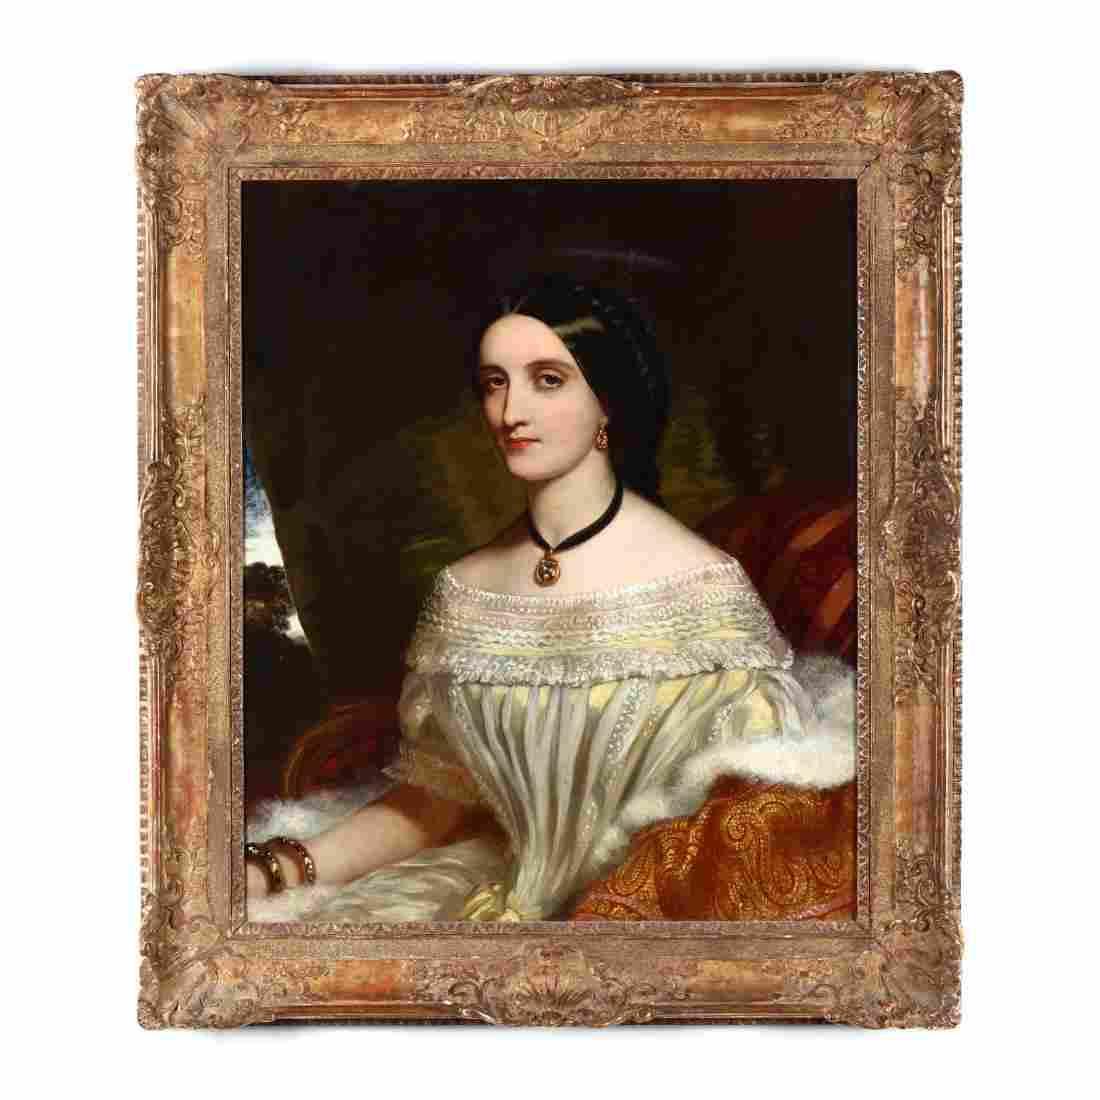 An Antique Portrait of a Woman, circa 1840